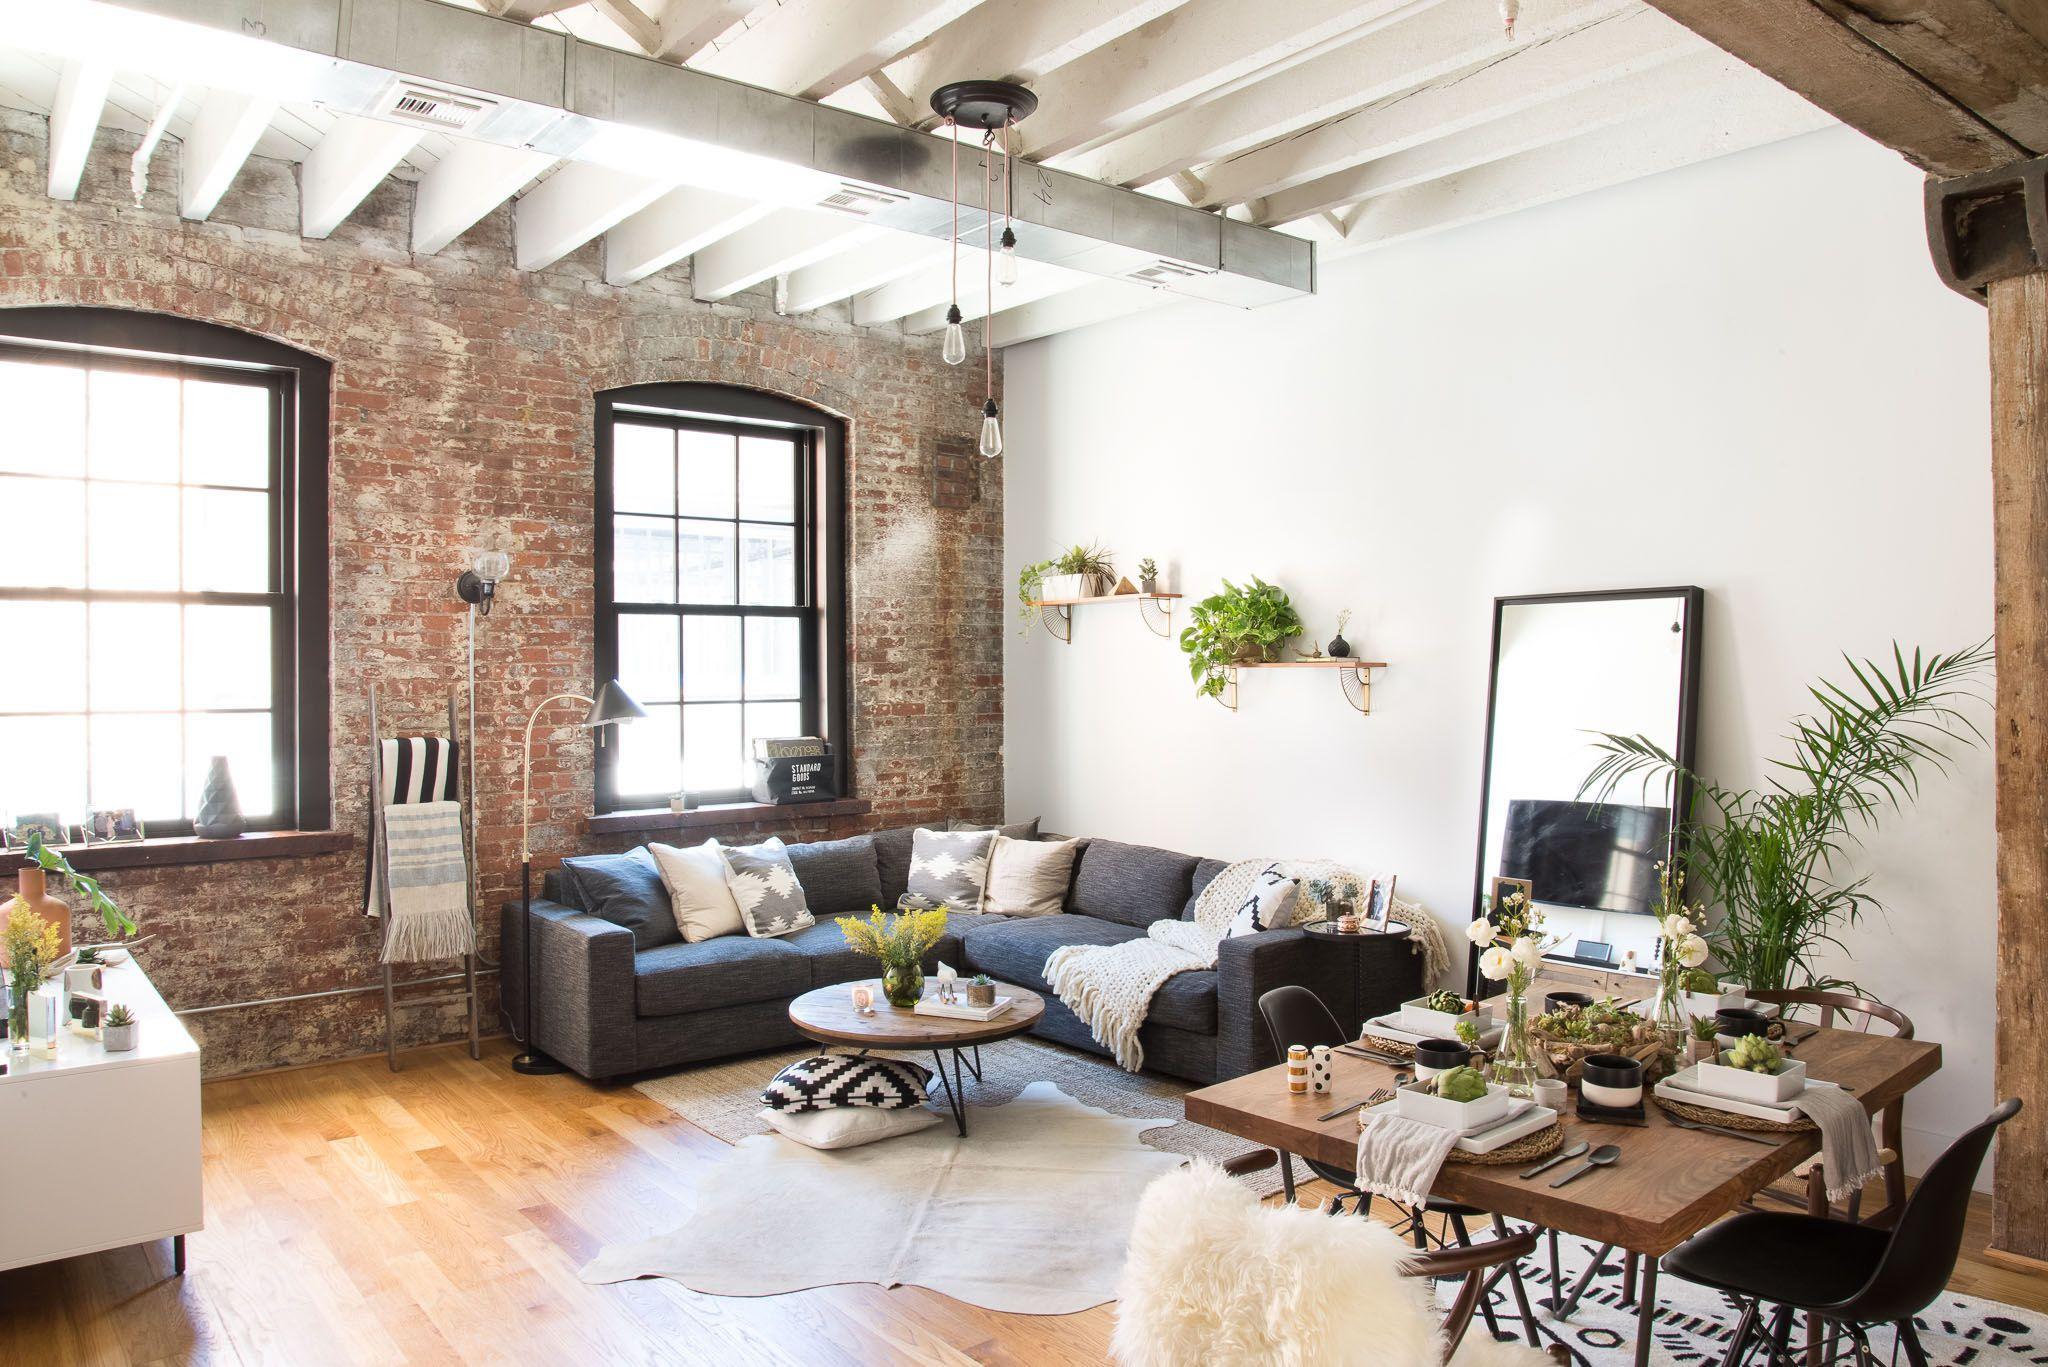 cozy room design & 14 Cozy Living Room \u0026 Bedroom Ideas - How to Design a Warm Room